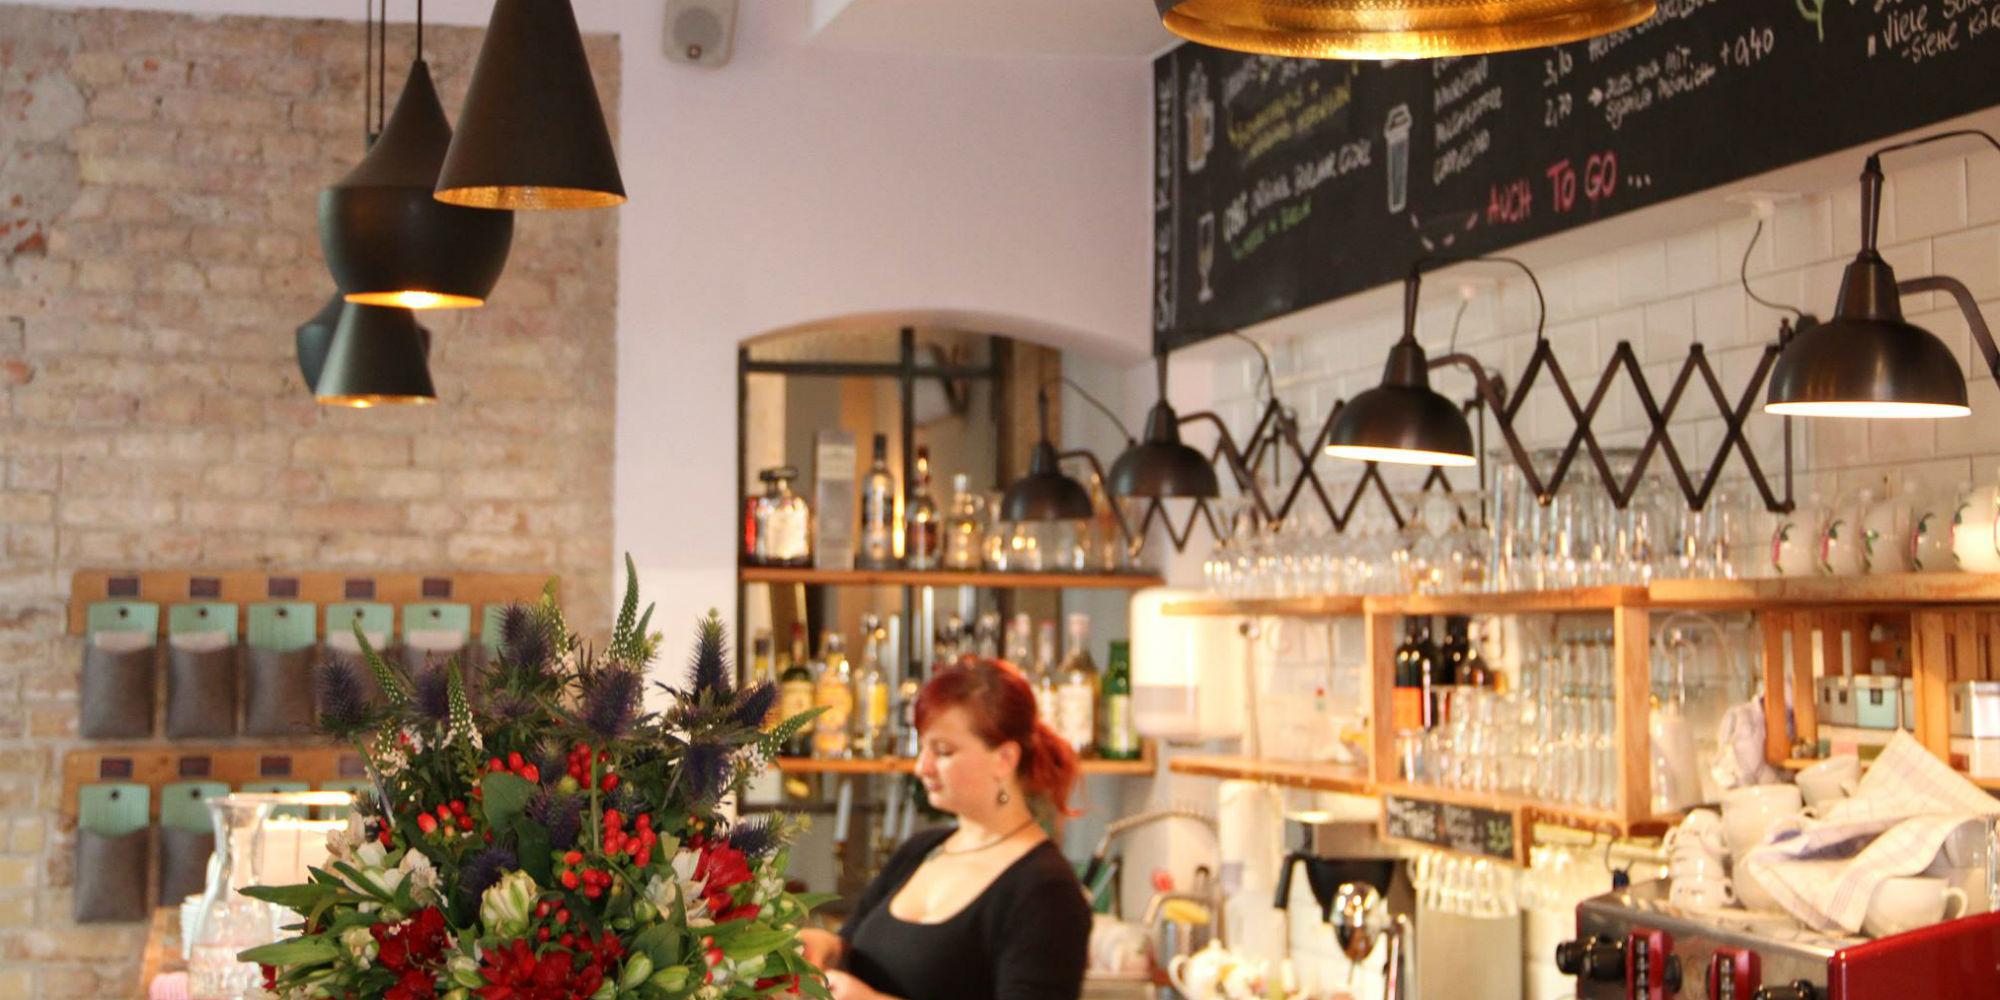 Brunch KRONE, kitchen & coffee (10435 Berlin)